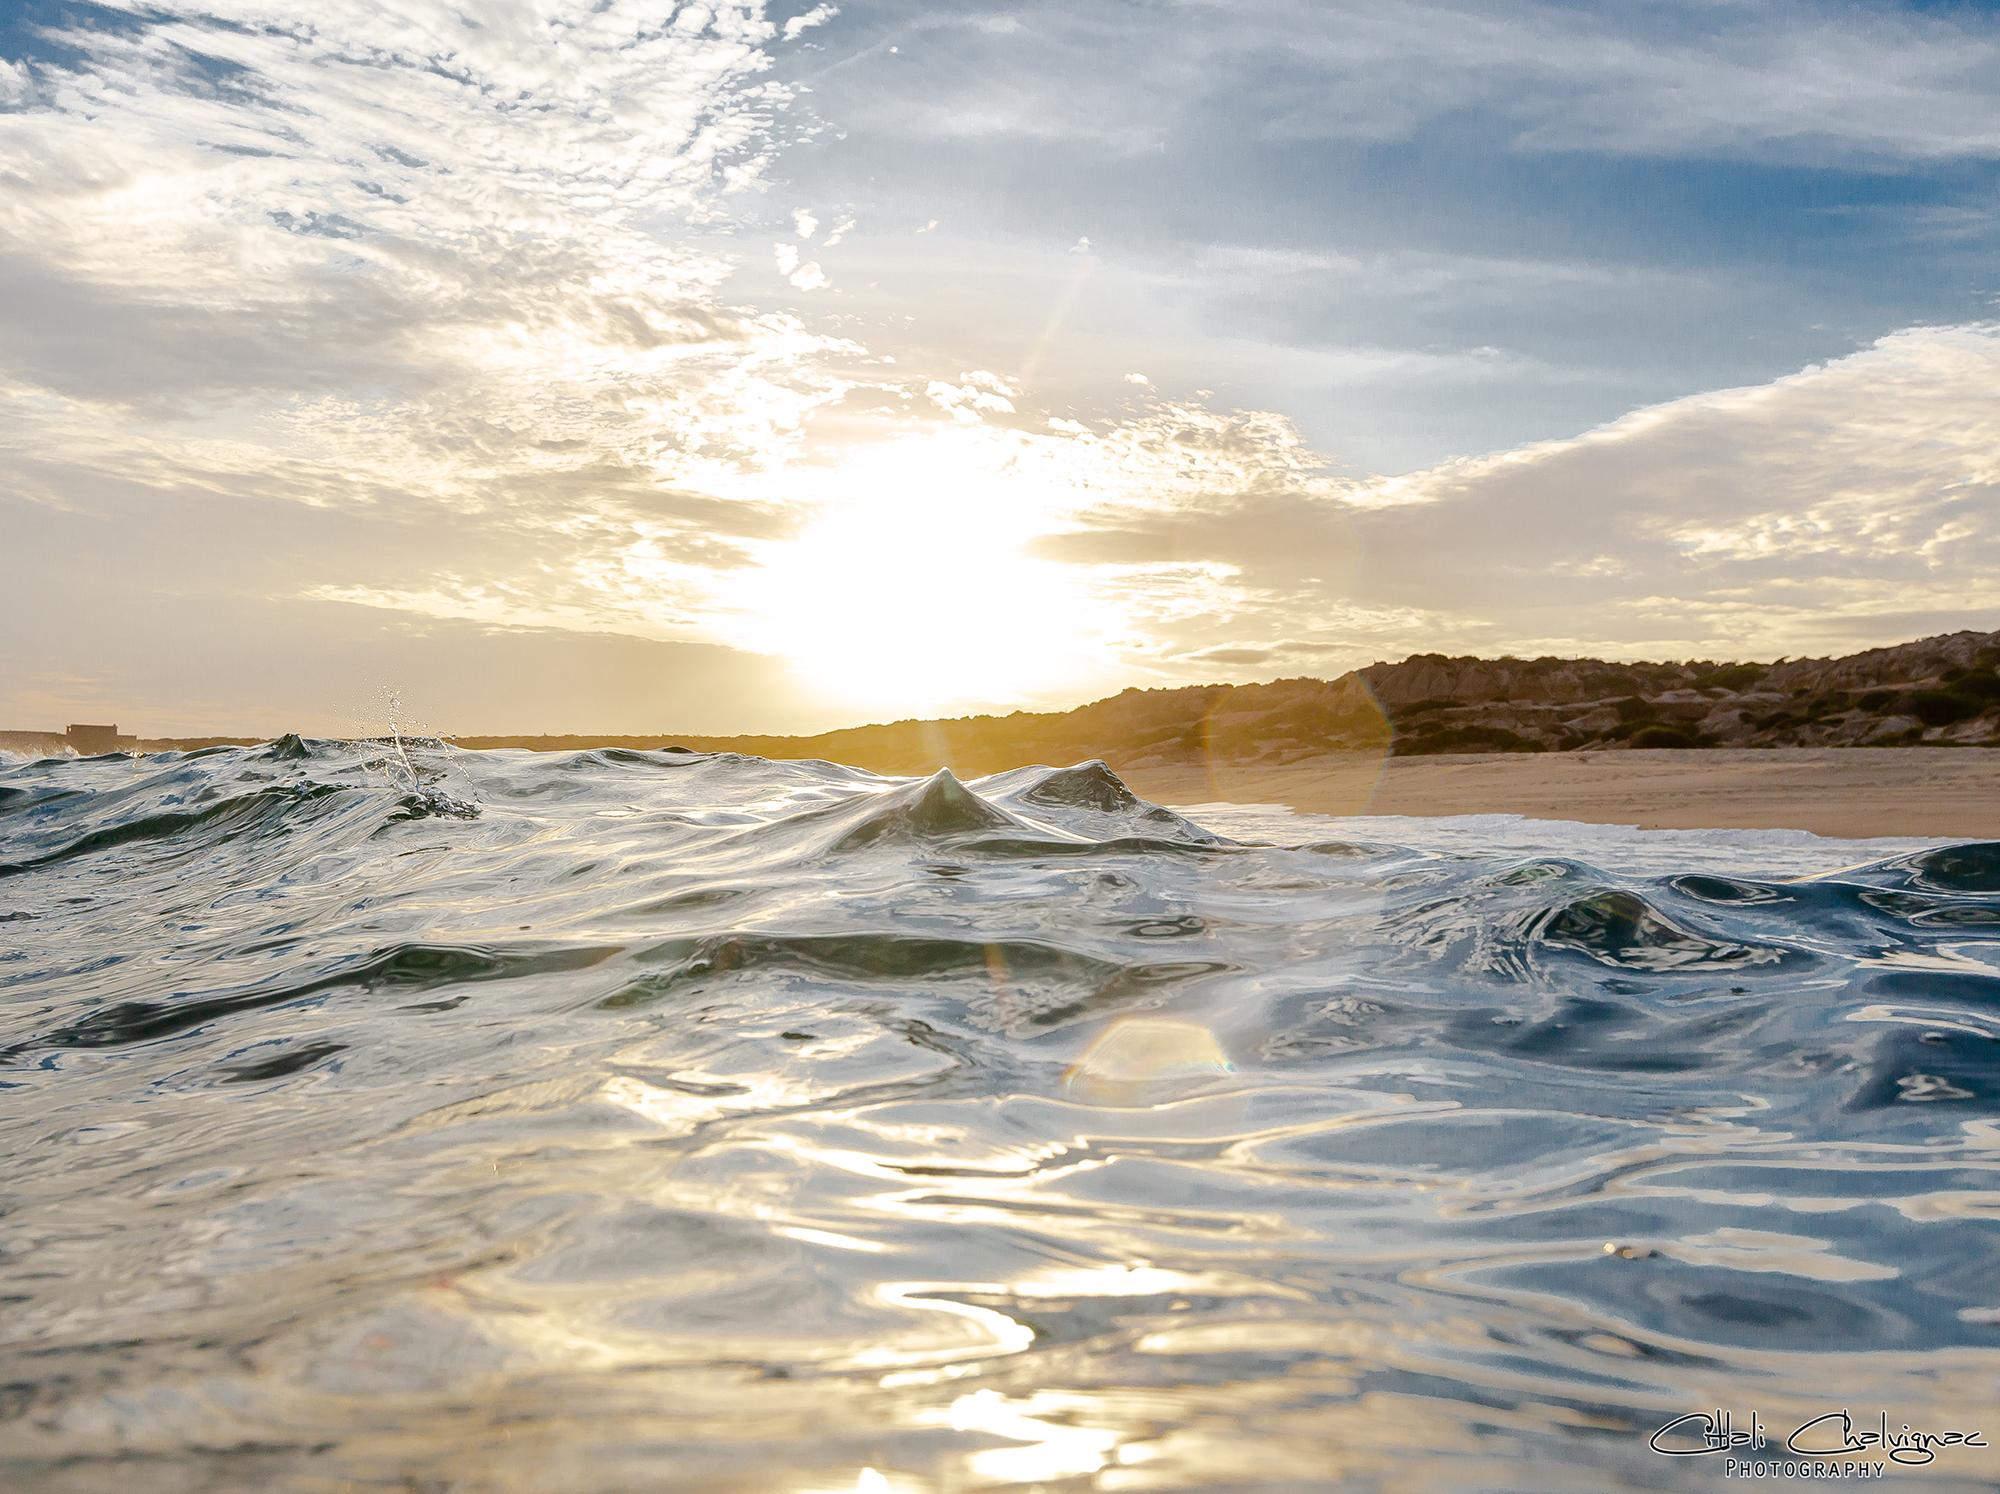 Galeria Ocean imagen 7 Citlali Chalvignac